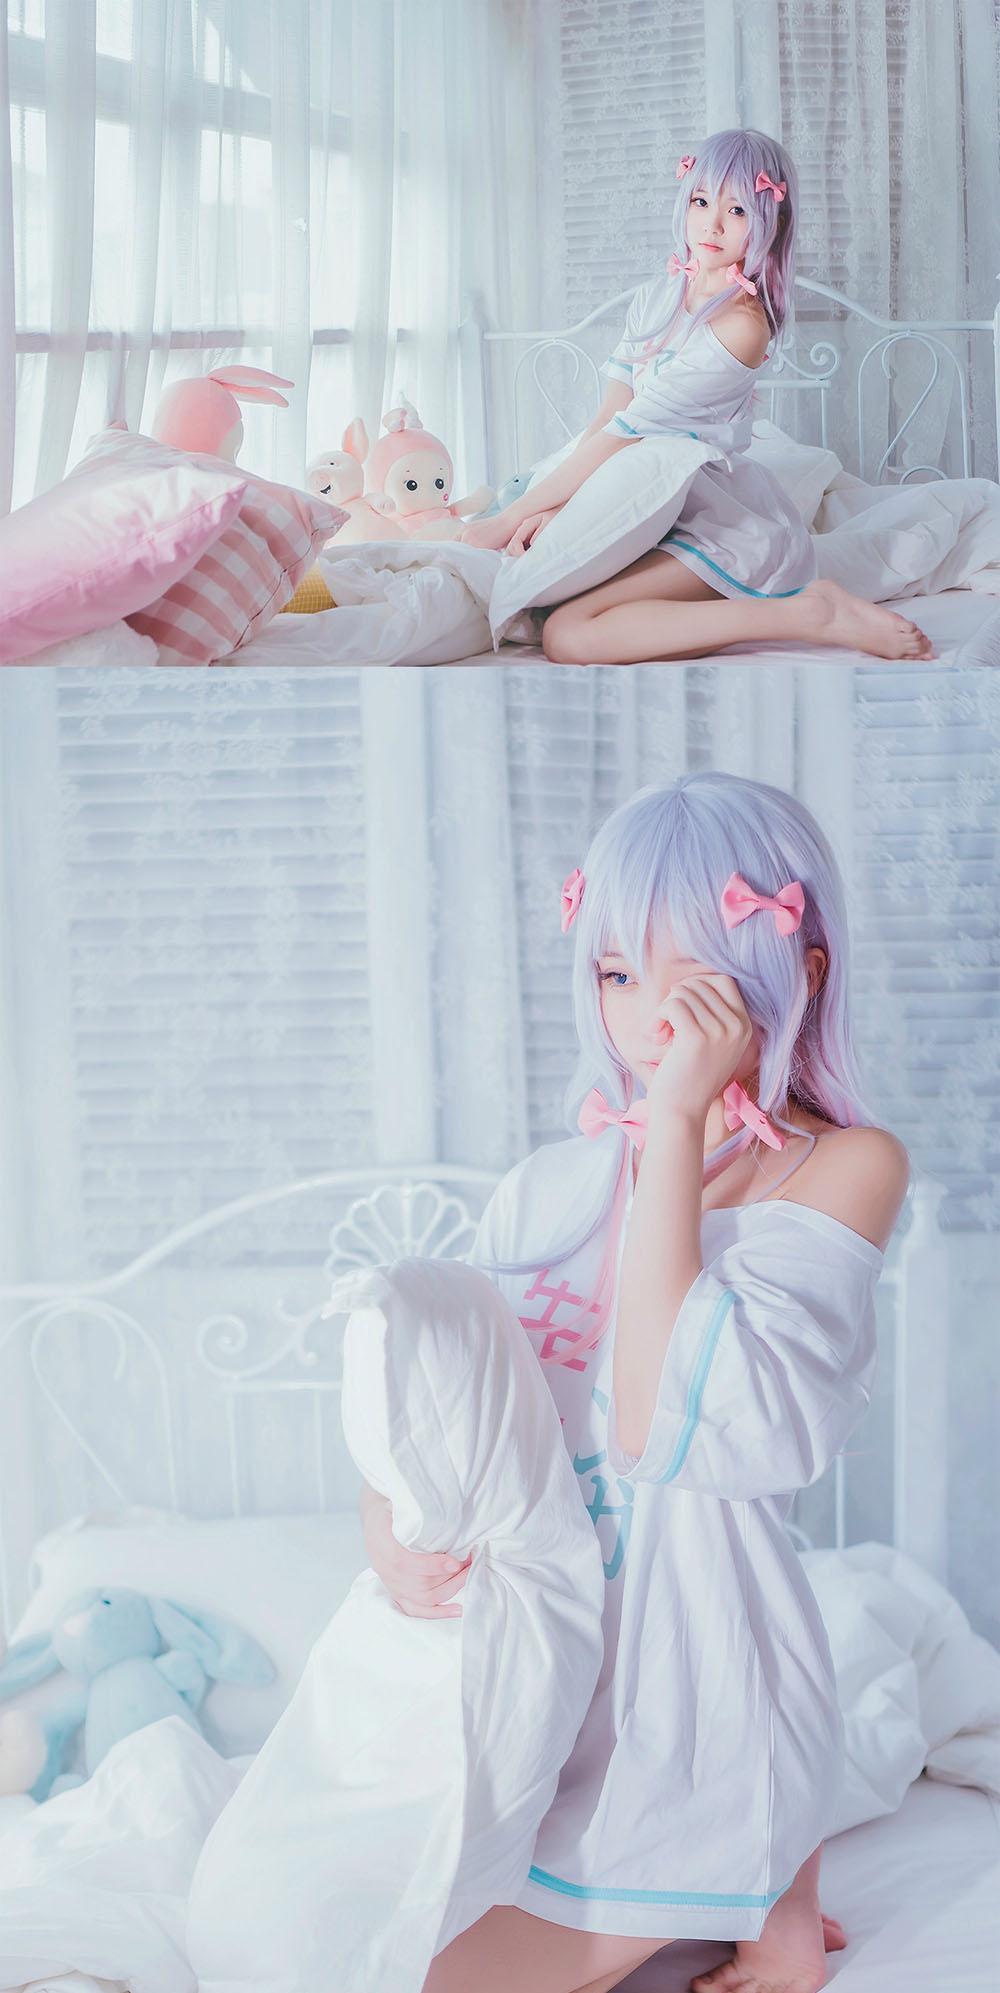 【Cosplay】推特福利cosplay2019-03-18-小柚妹站